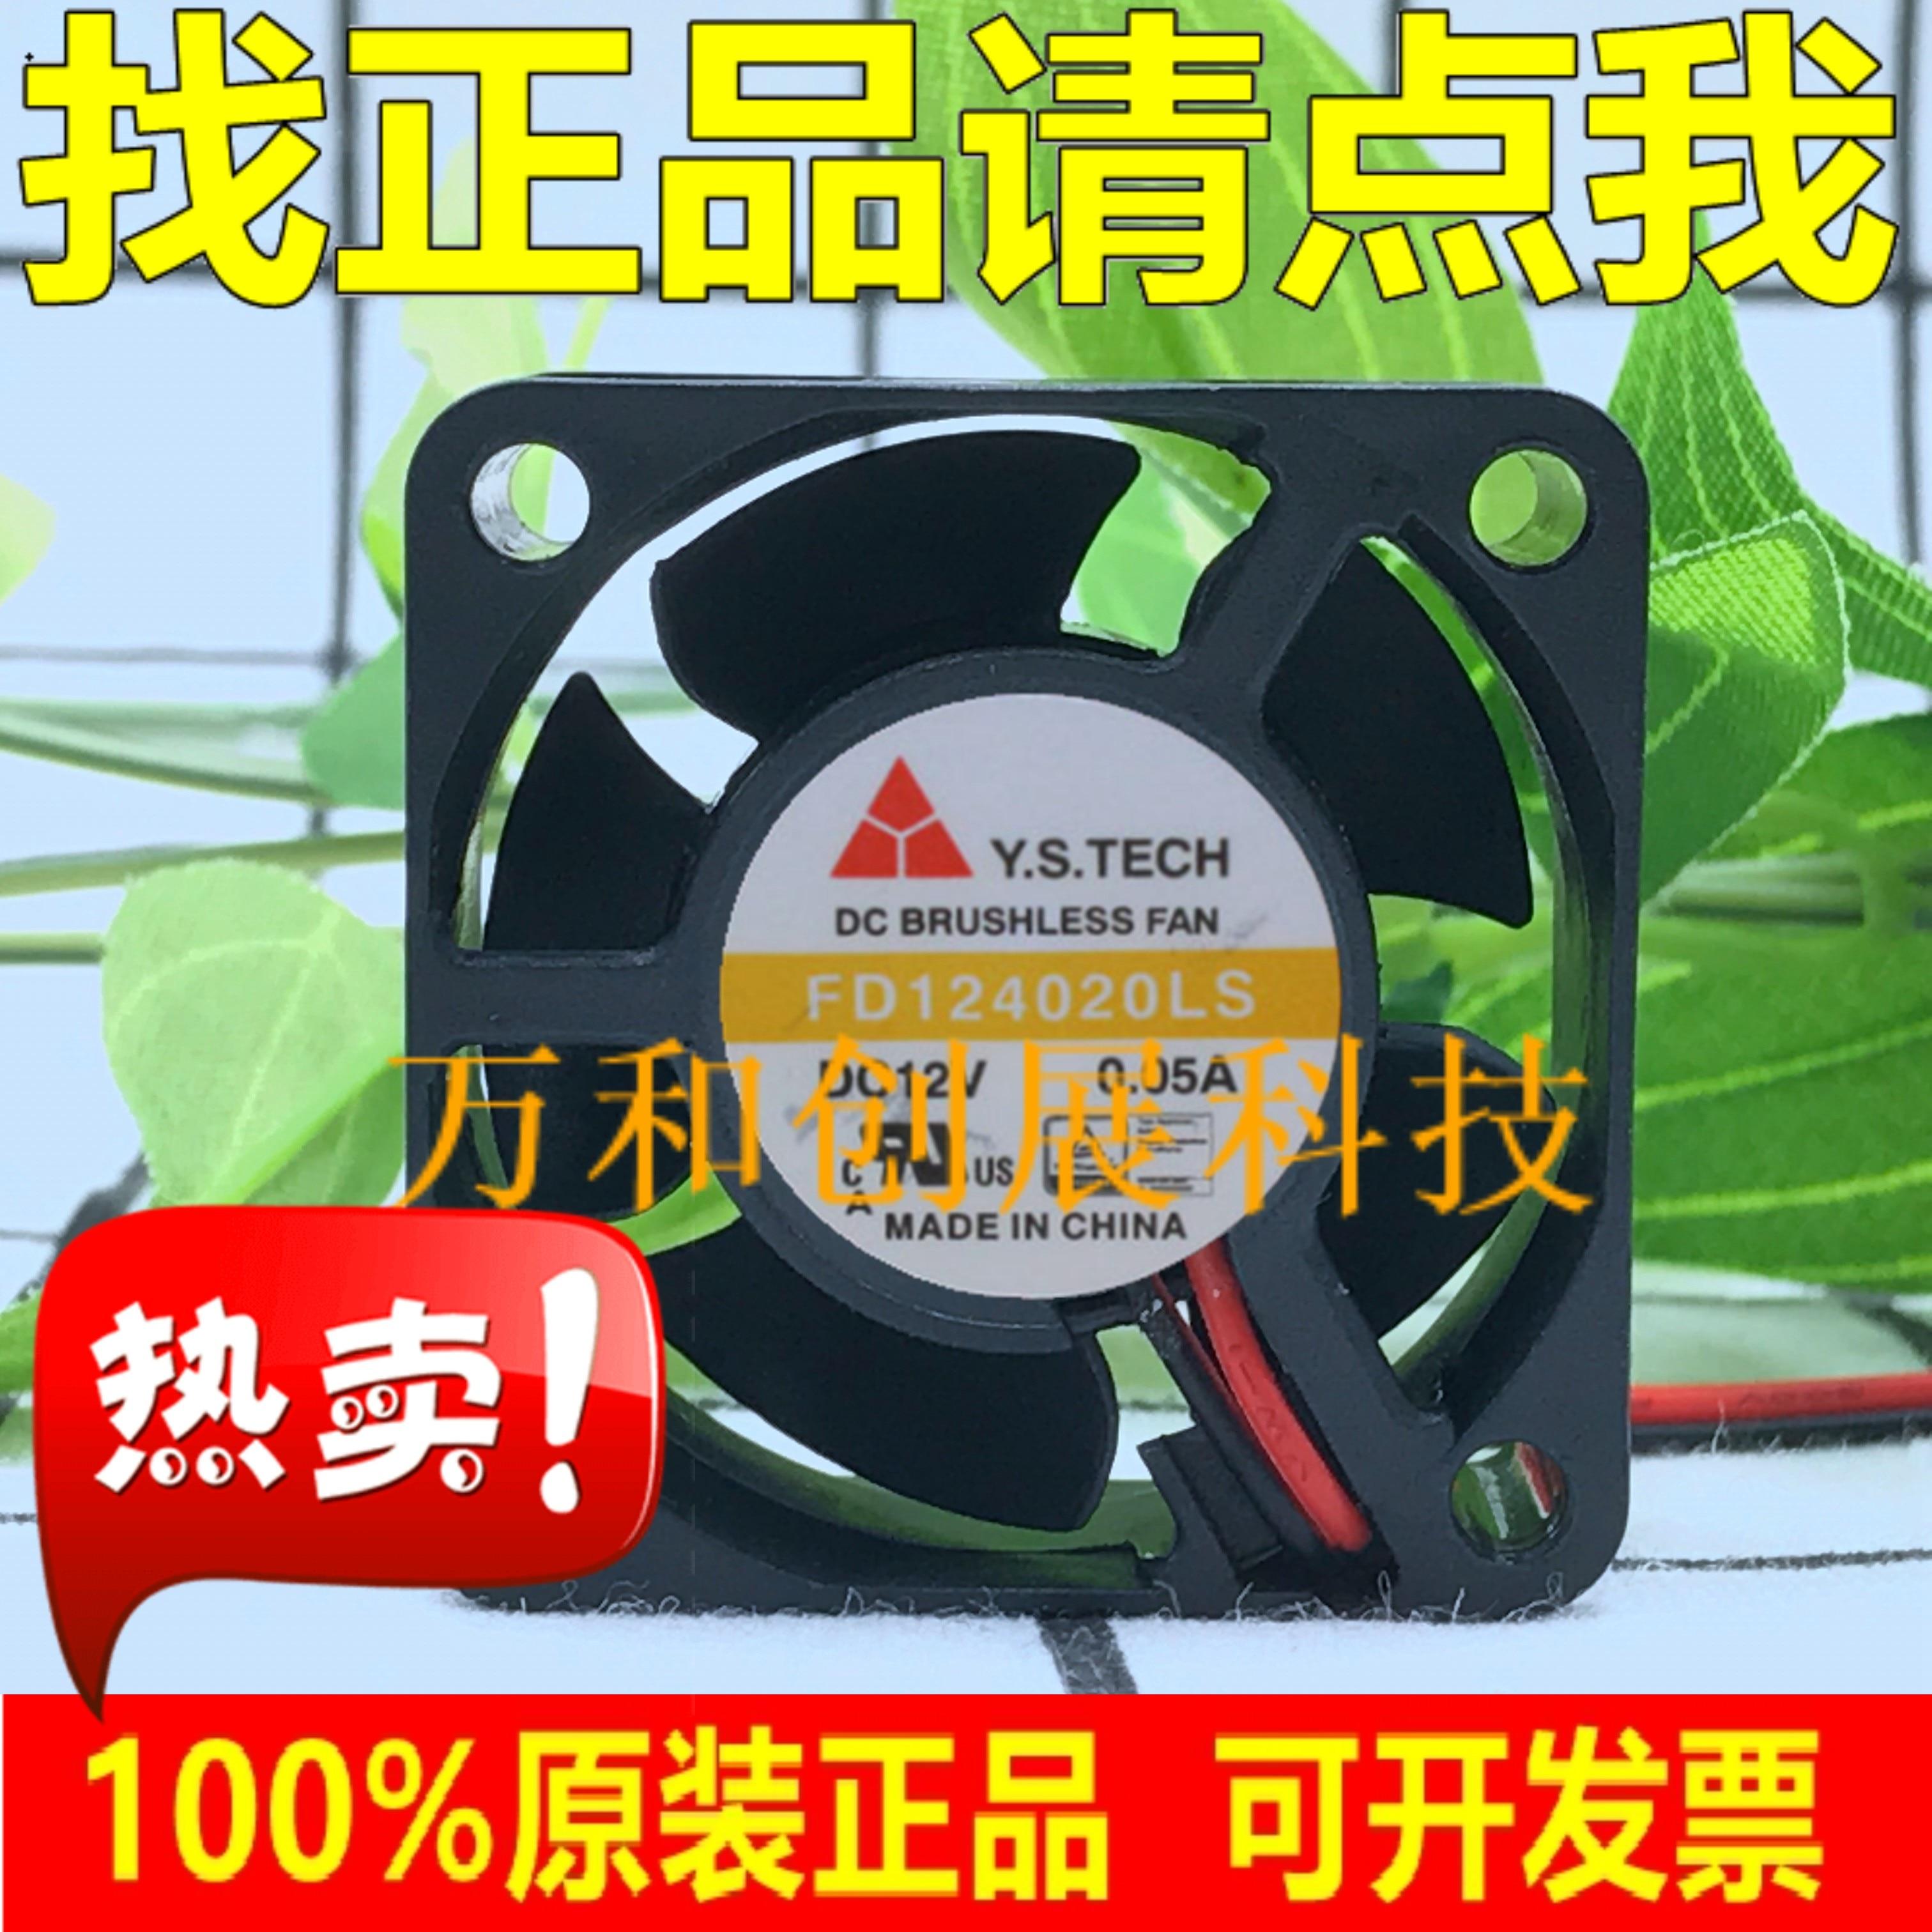 Y.S FD124020LS 4020 12в 0.05A 4 см/см ультра-тихий вентилятор